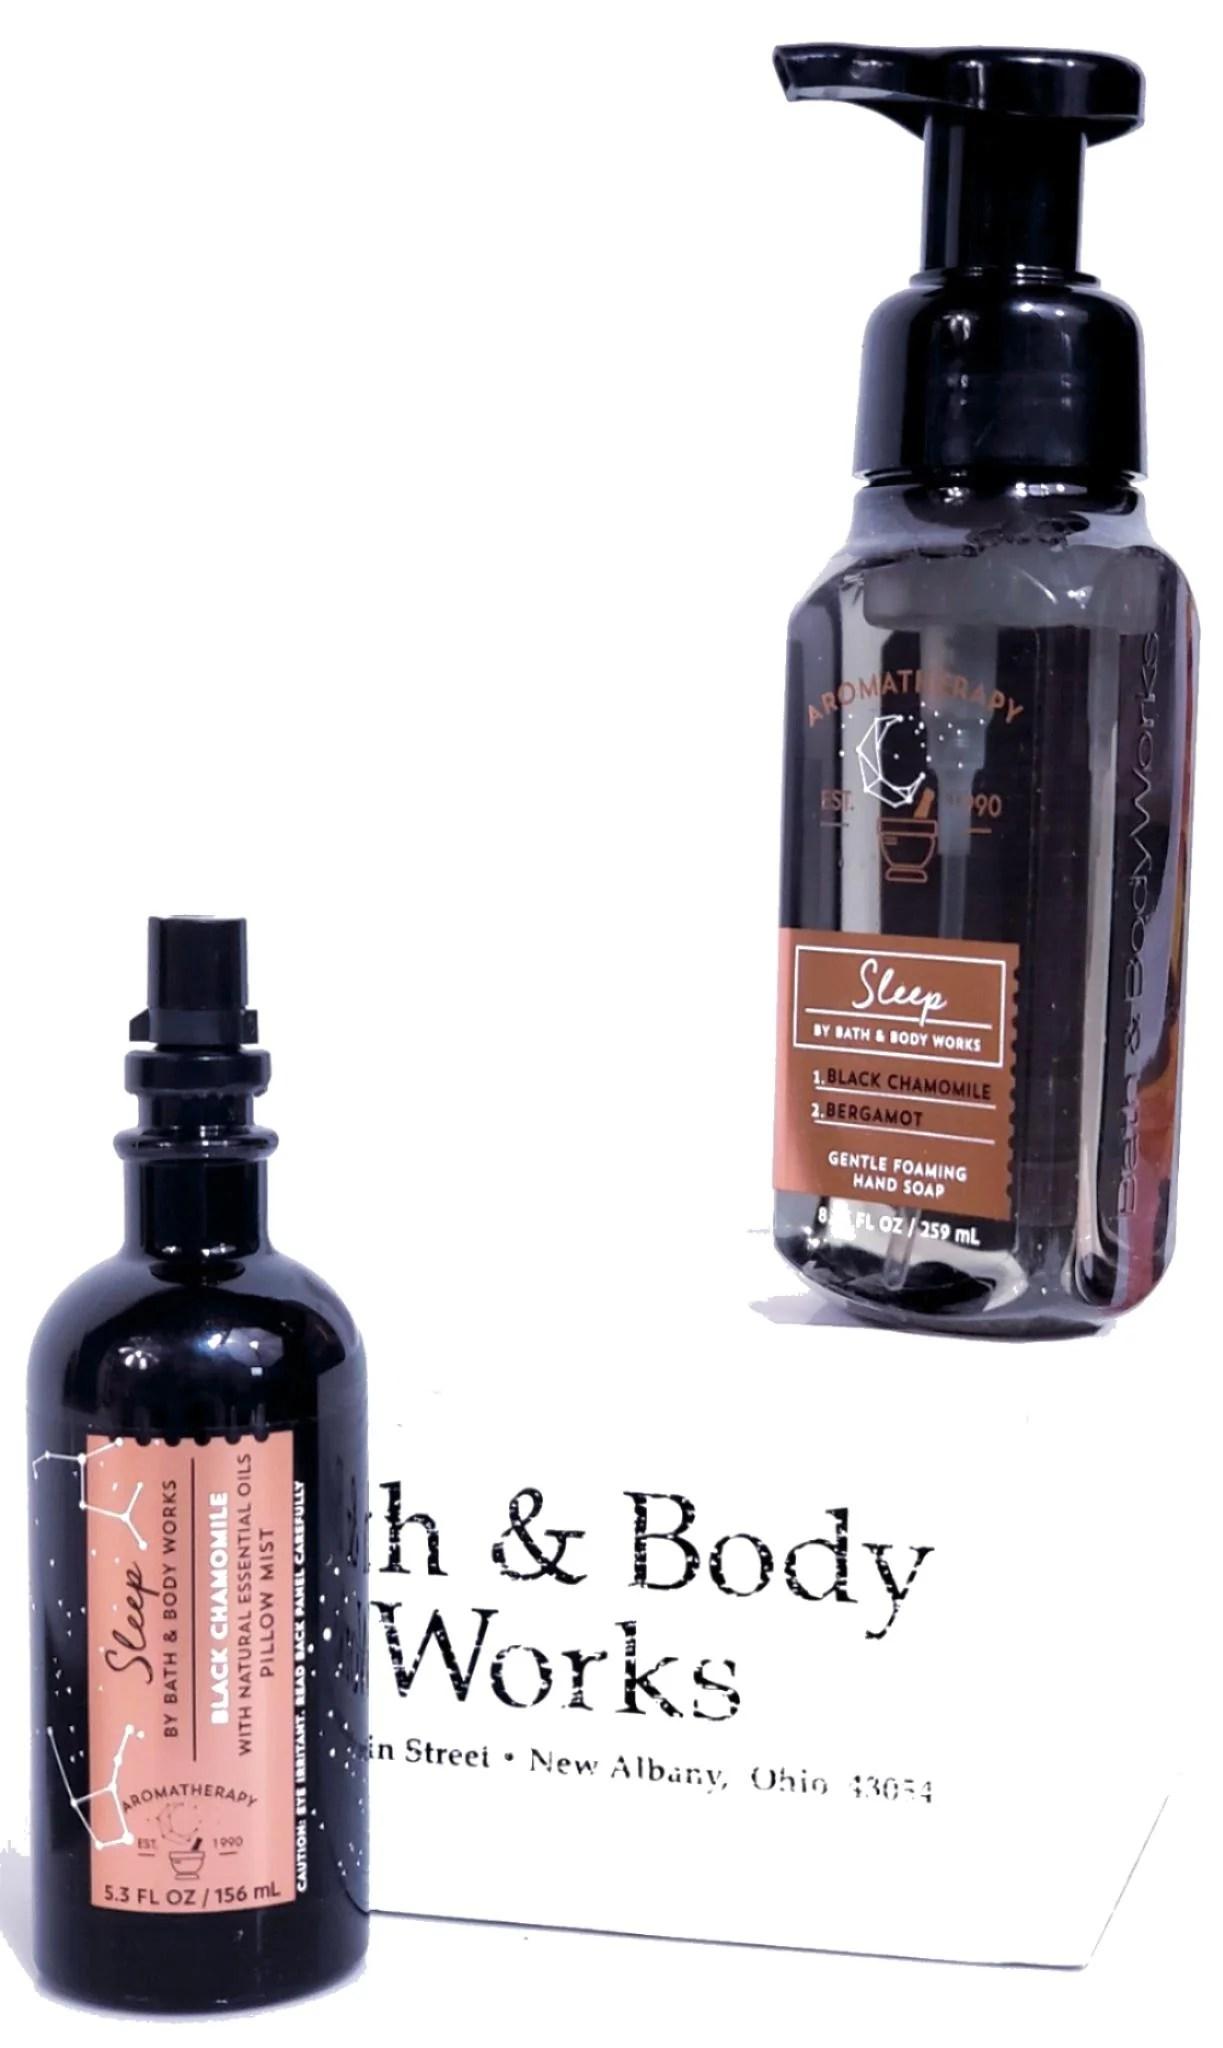 bath body works sleep foam hand soap